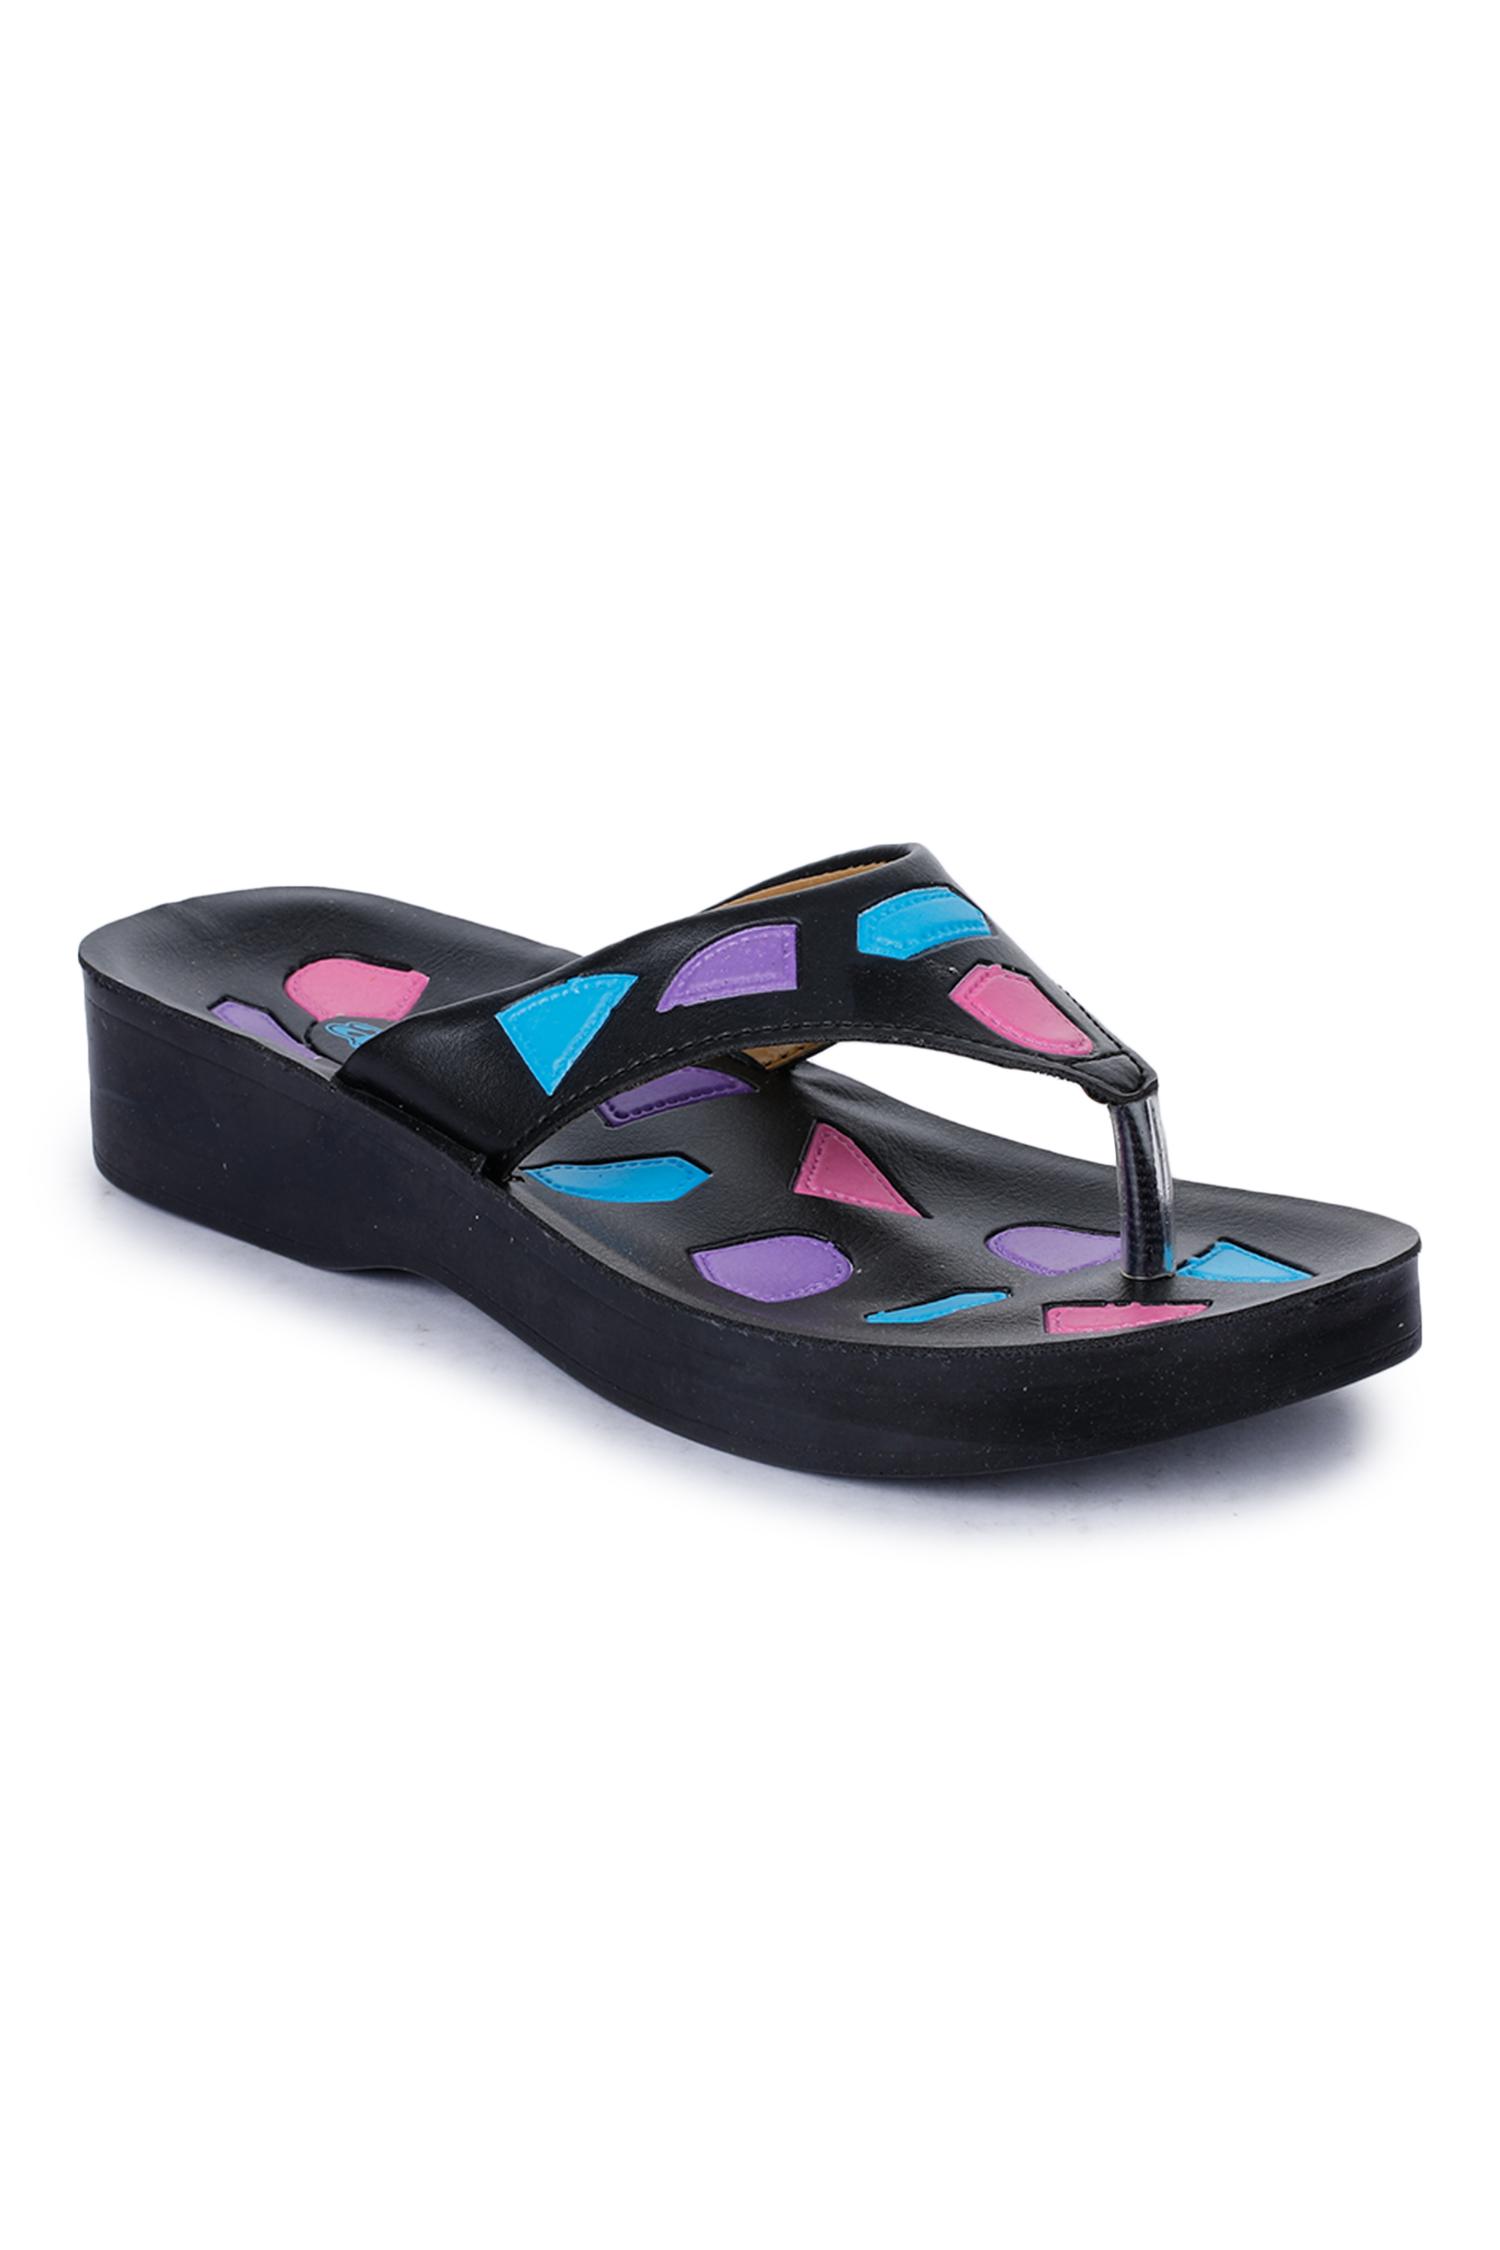 Liberty | Liberty A-HA Black Flip Flops NAPIER_Black For - Women